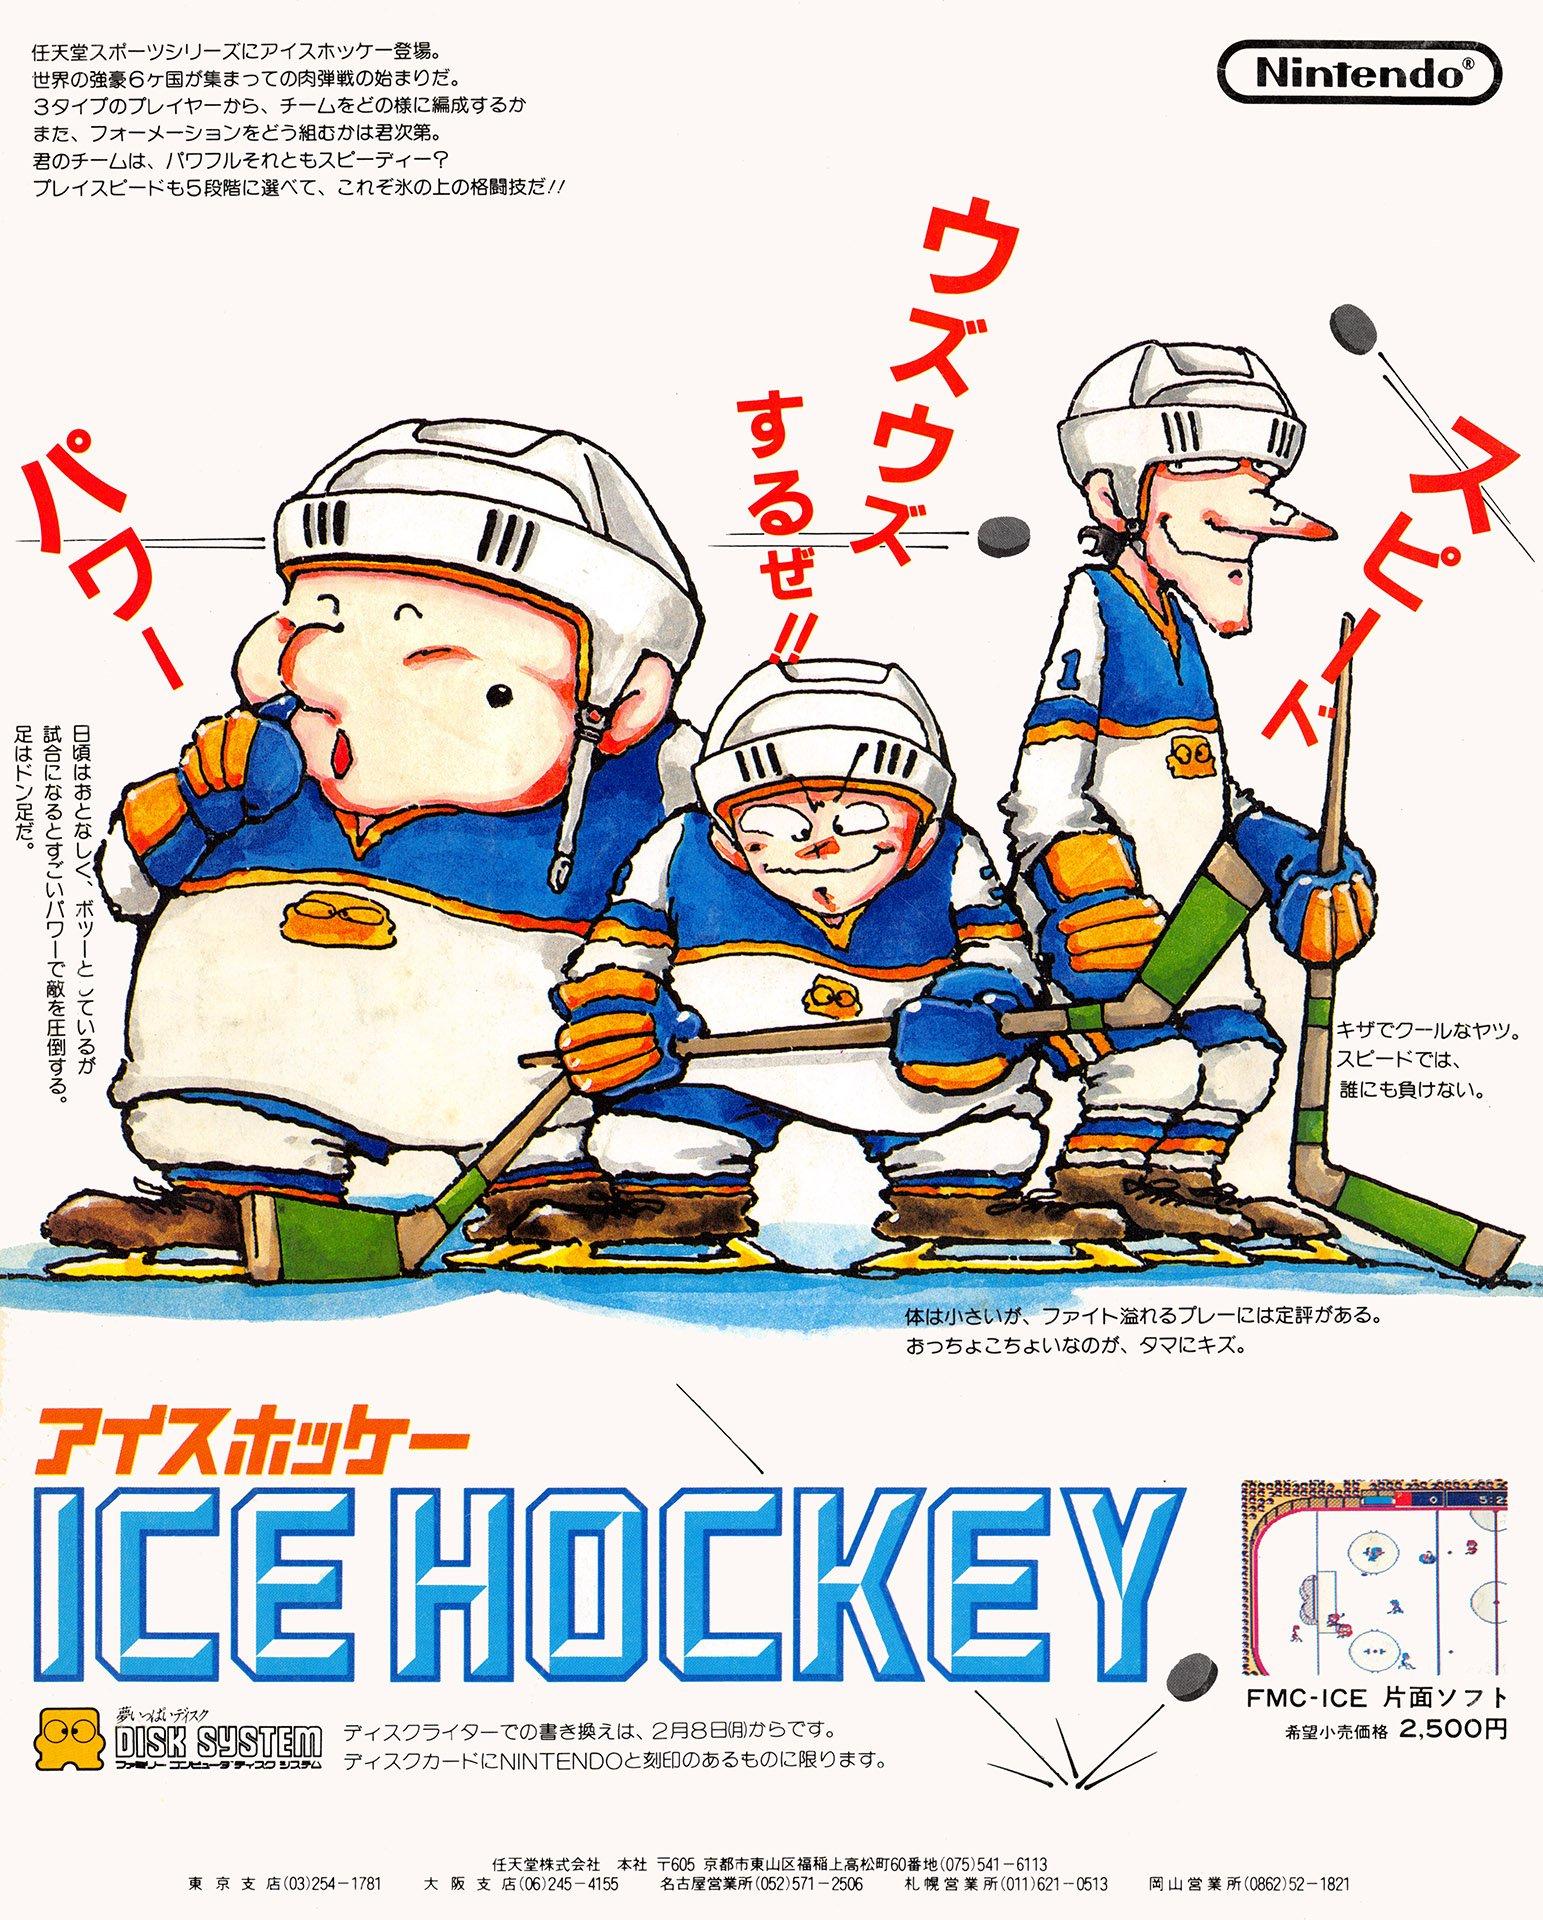 Ice Hockey (Japan)